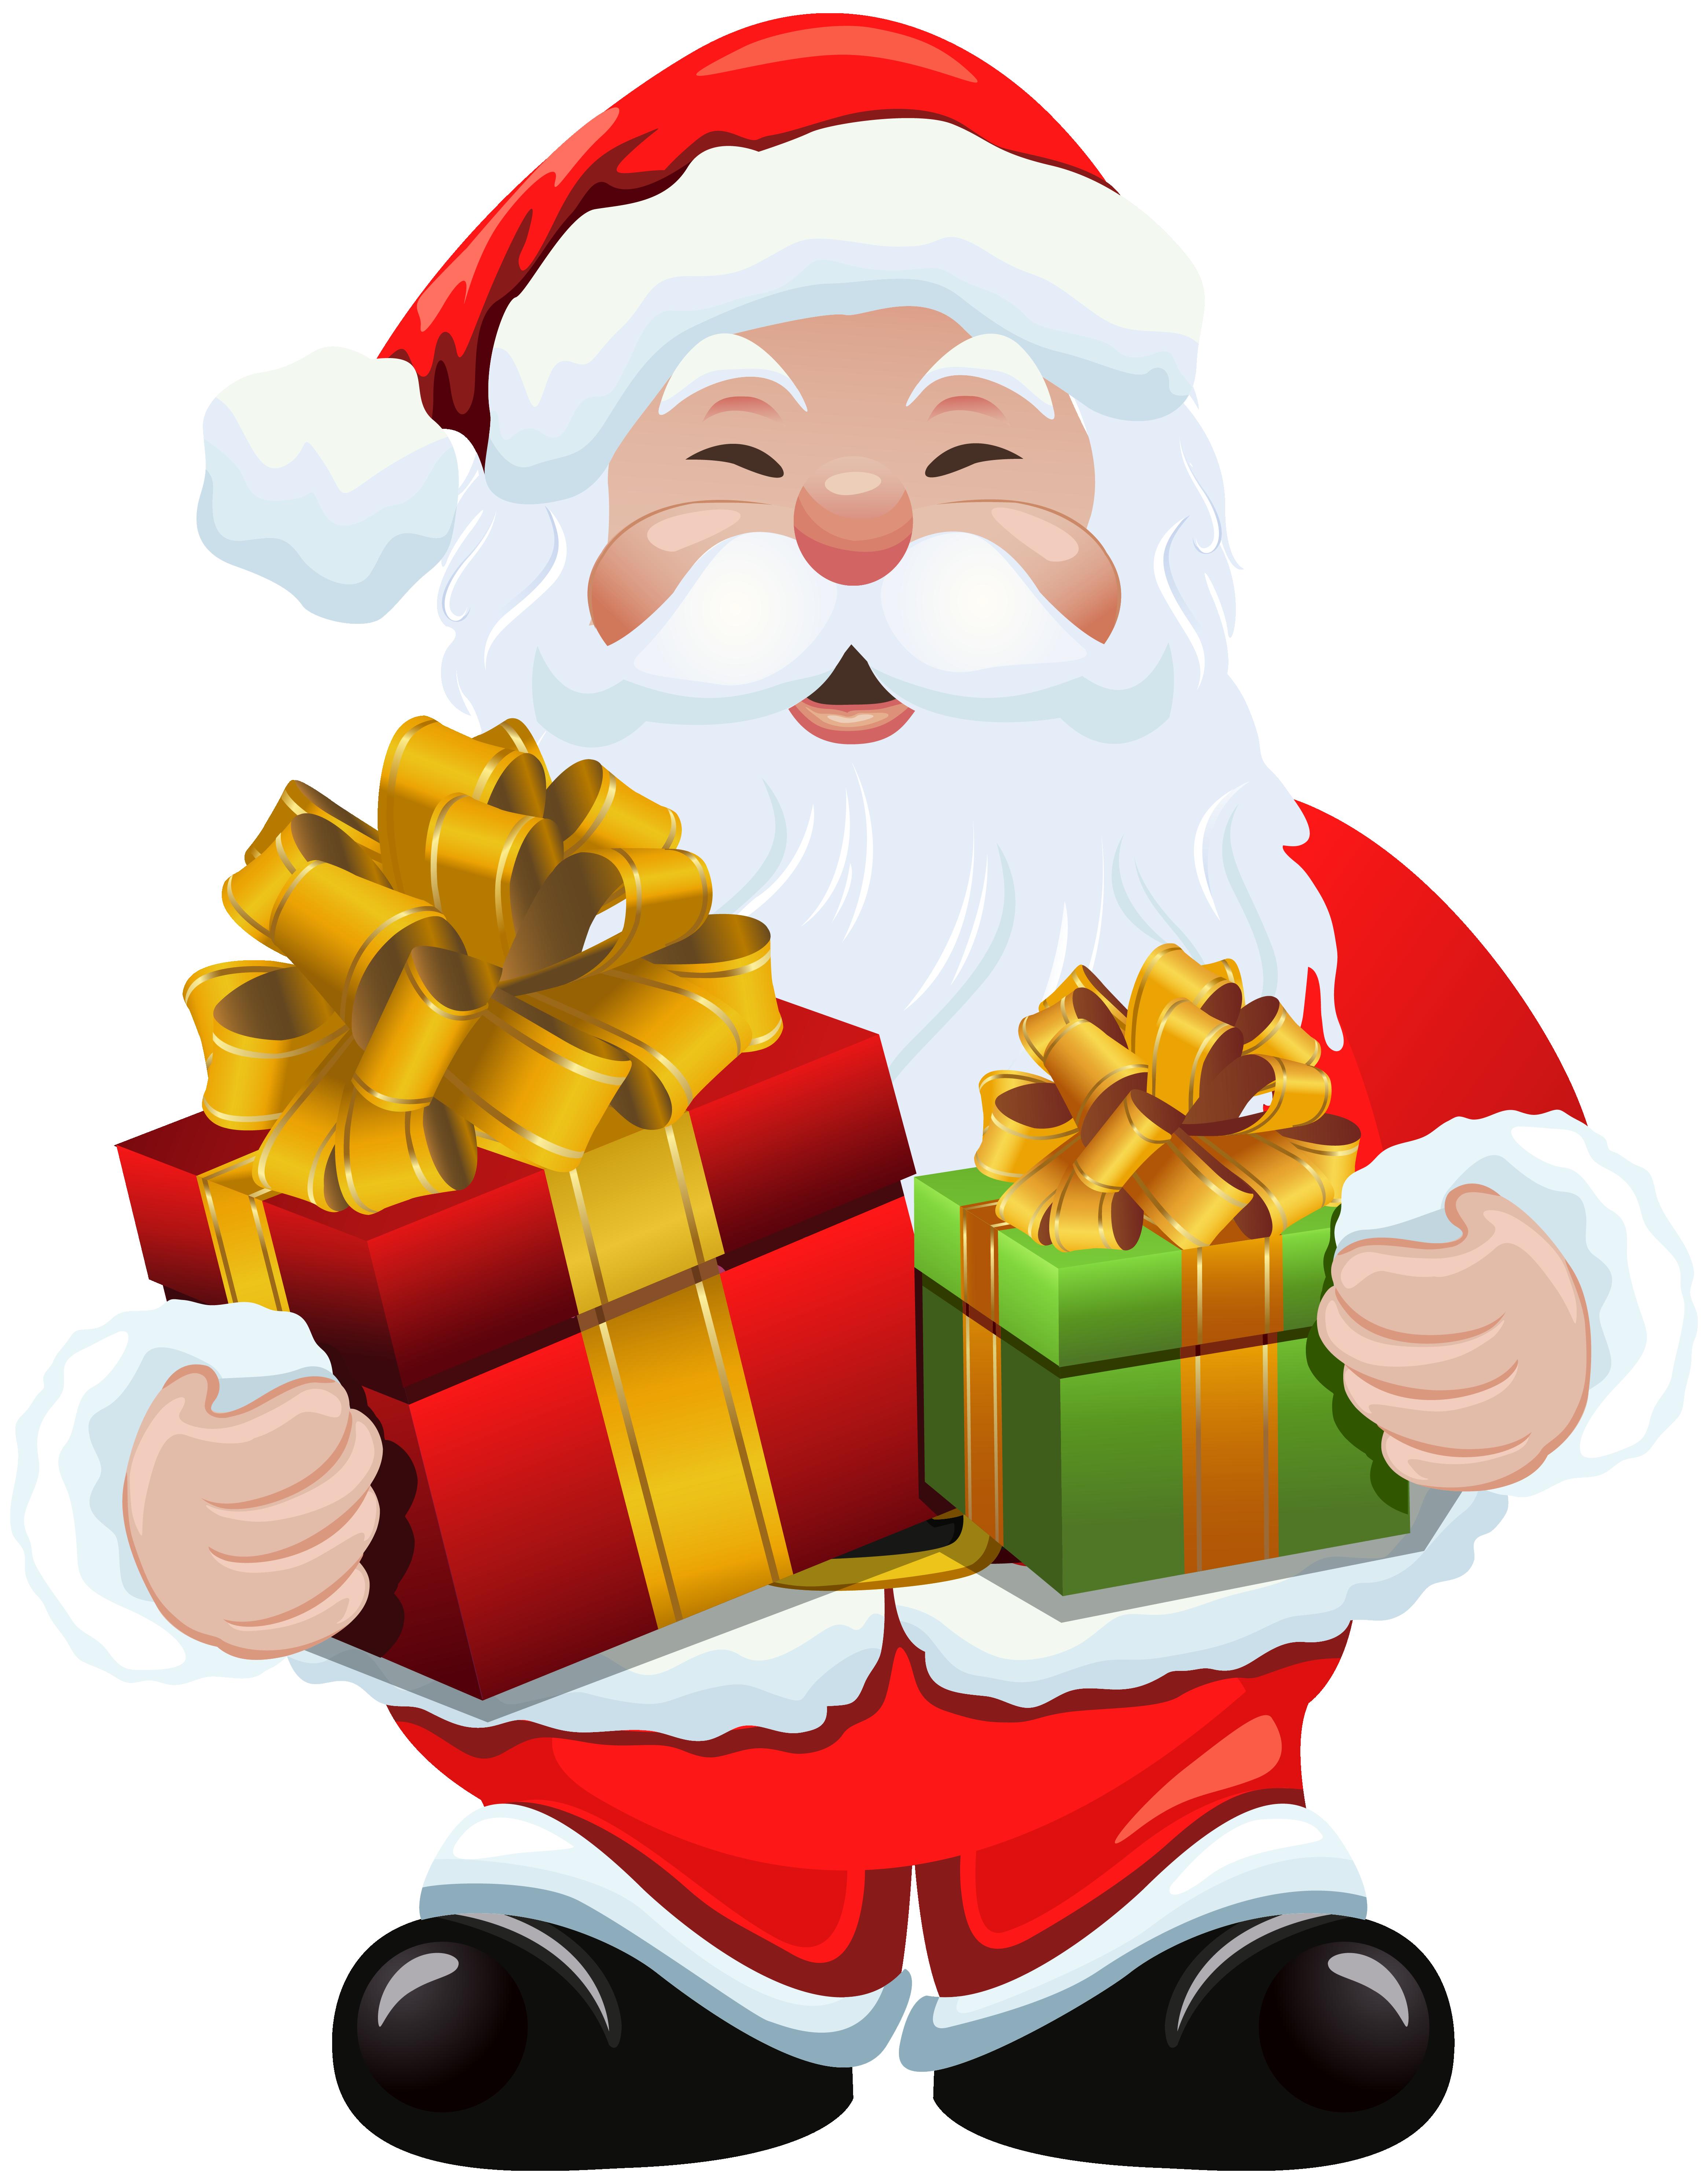 Santa clipart hand, Santa hand Transparent FREE for download.